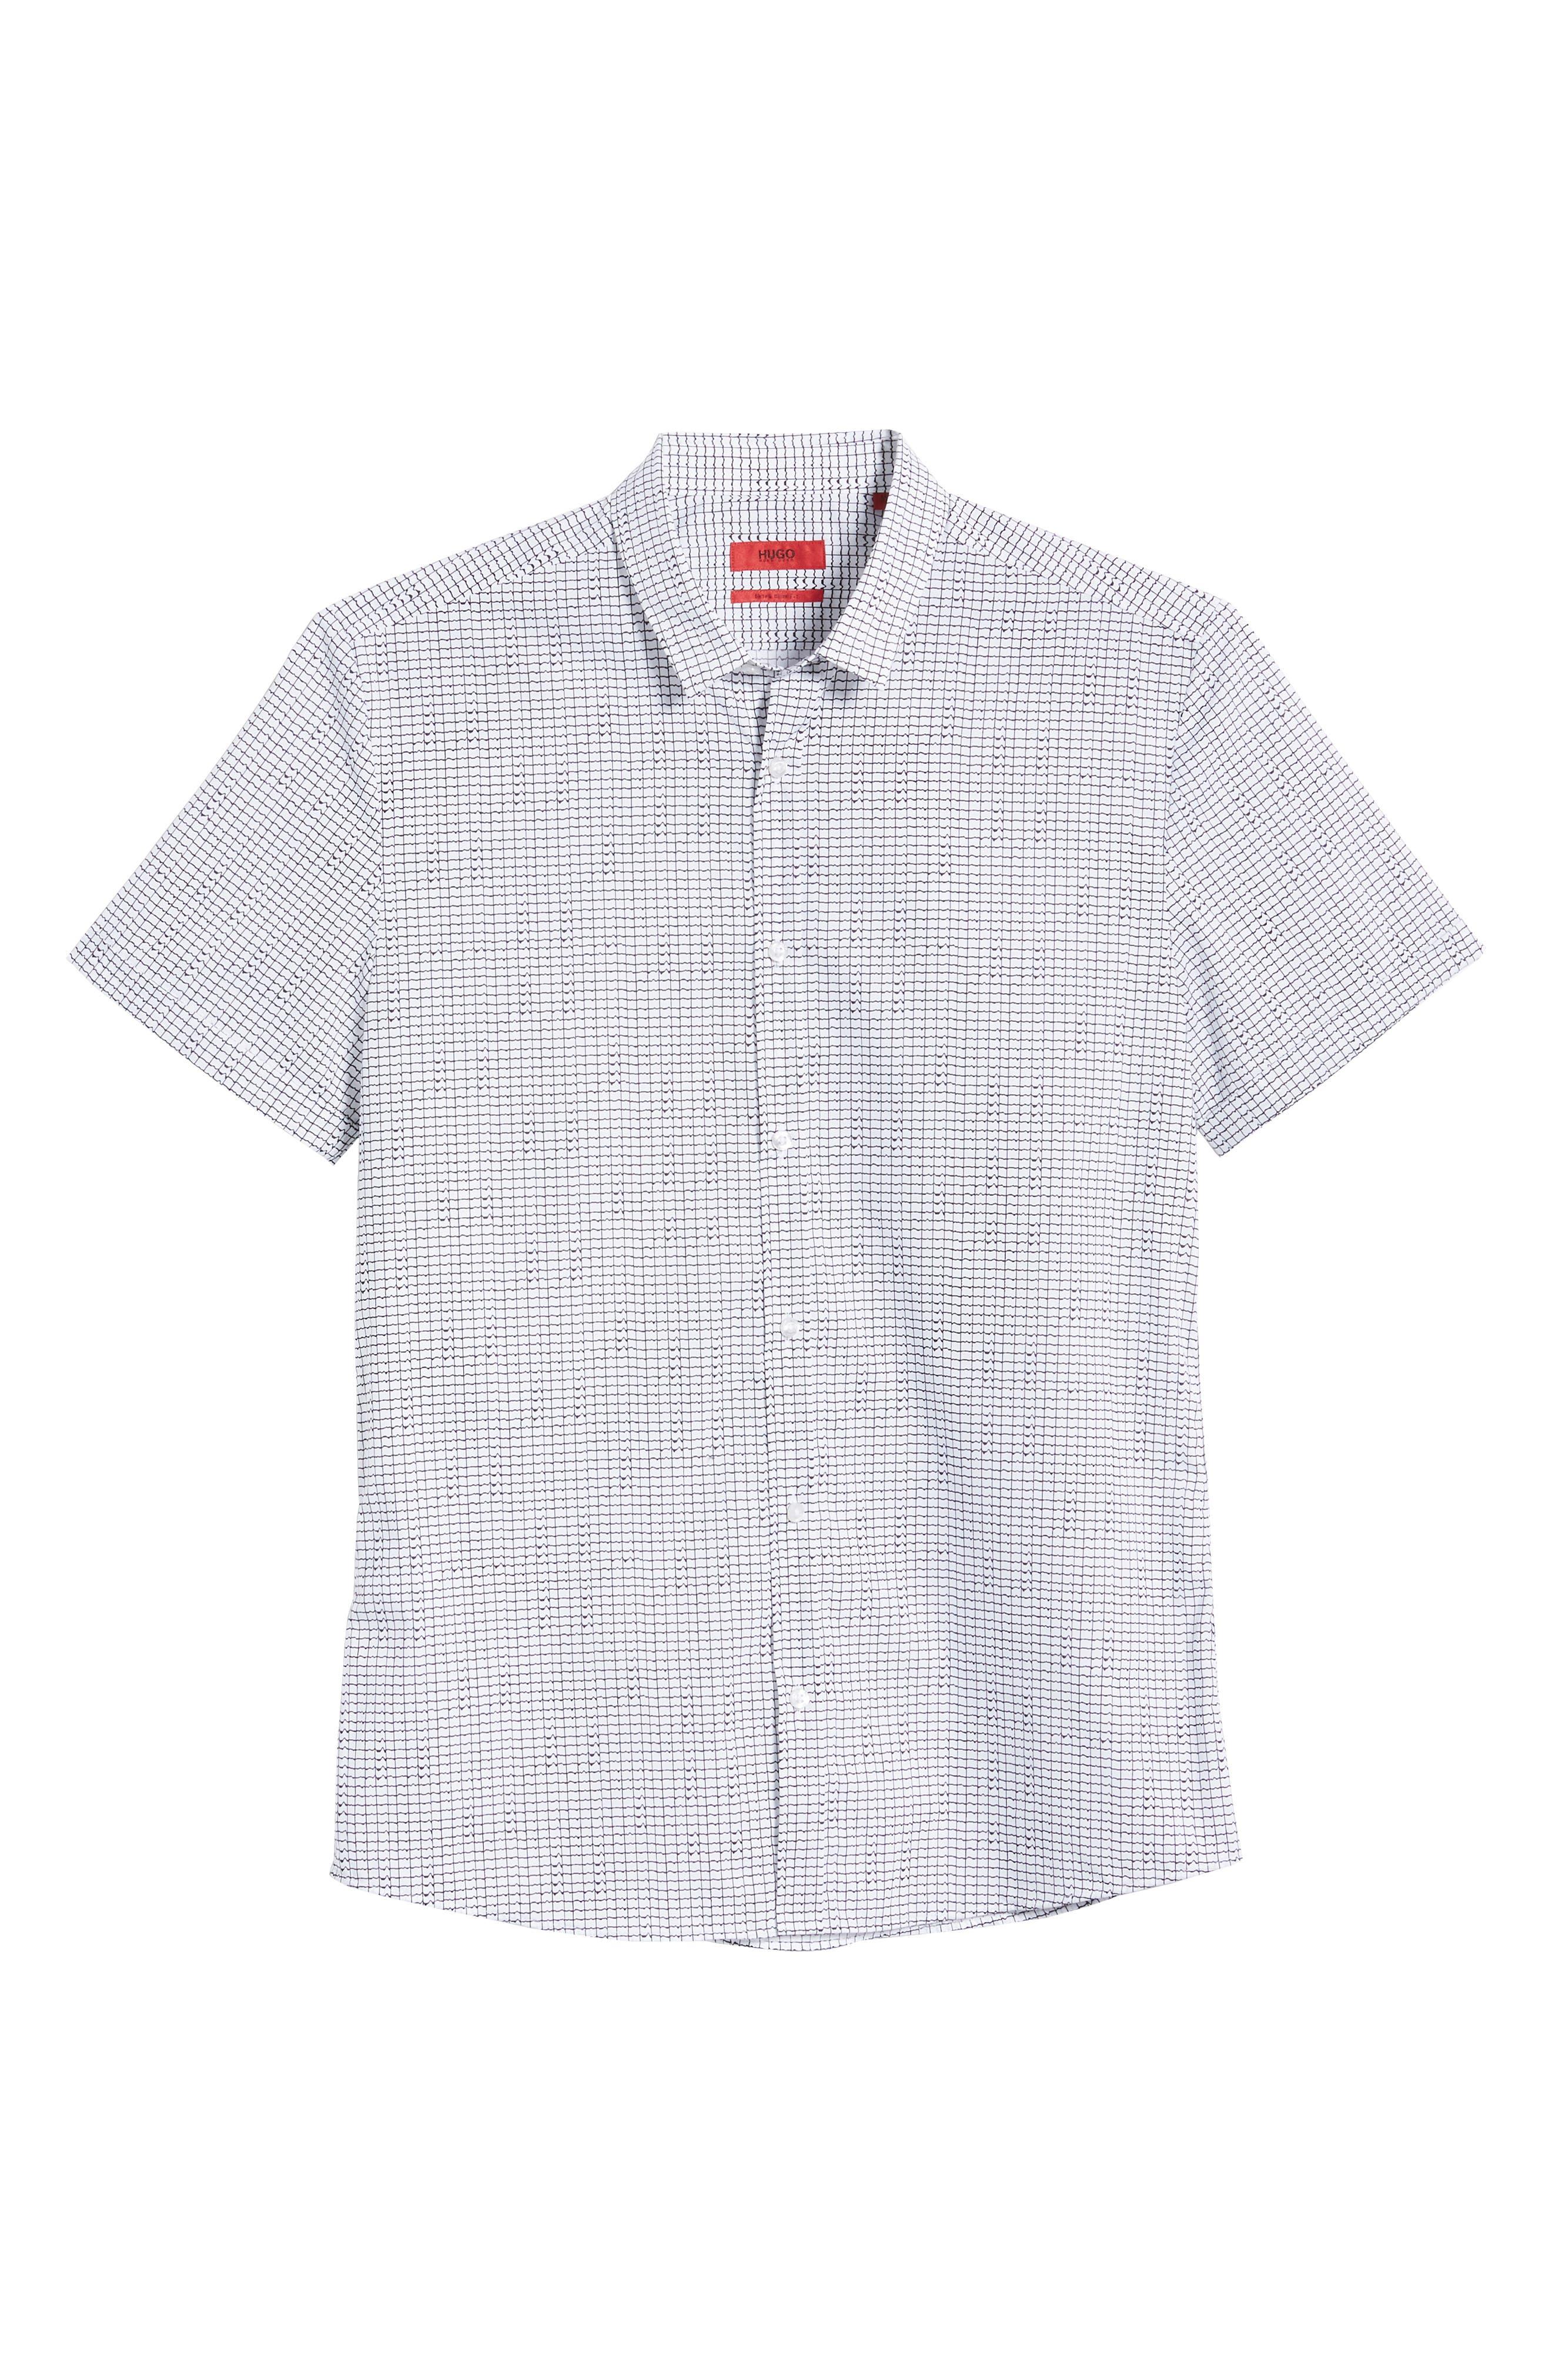 HUGO, Empson Slim Fit Print Sport Shirt, Alternate thumbnail 5, color, WHITE